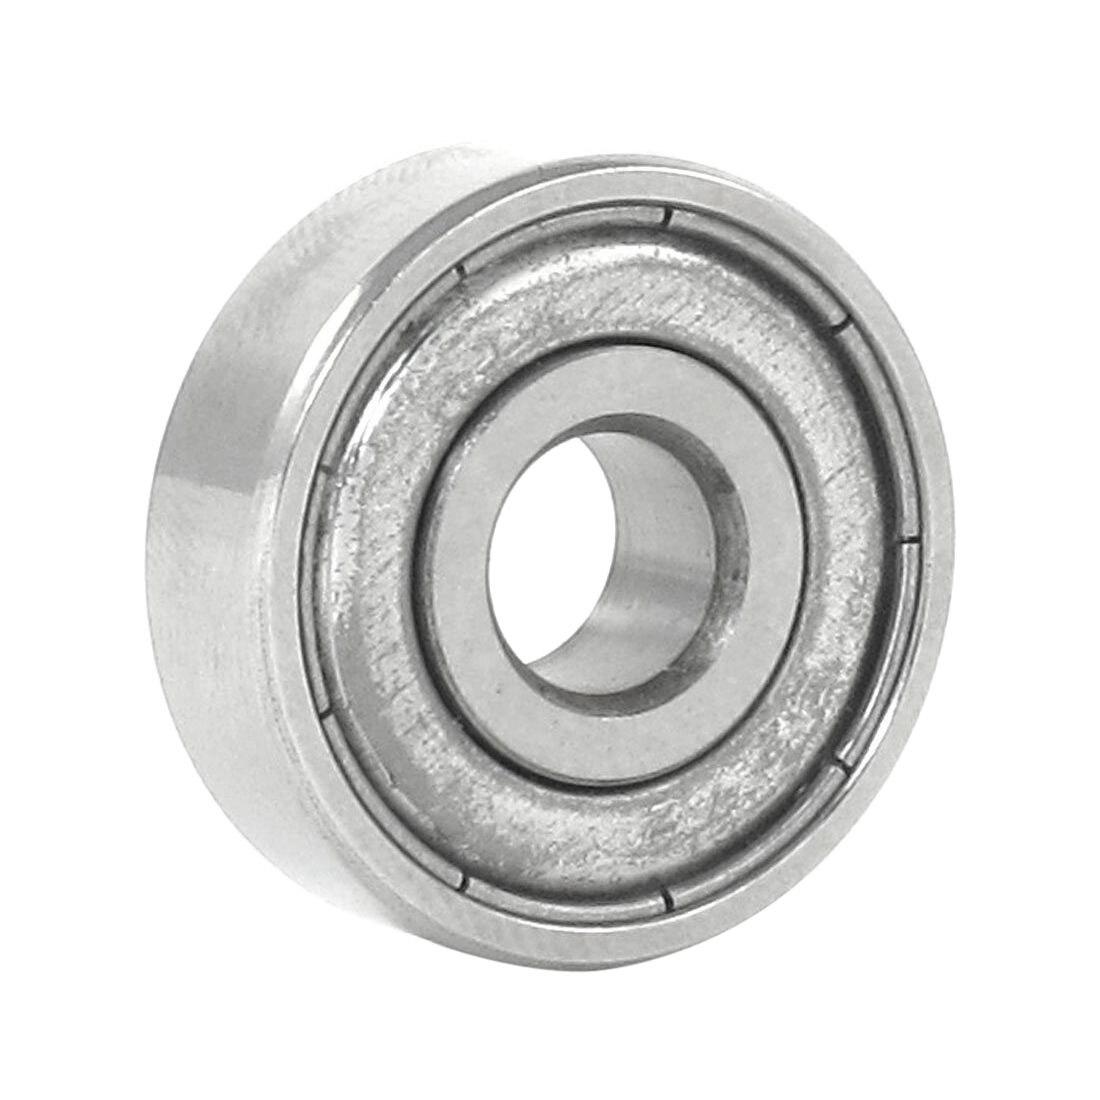 ELEG-Silver Metal 627Z Deep Groove Ball Bearing Ball Bearing 7mm X 22mm X 8mm